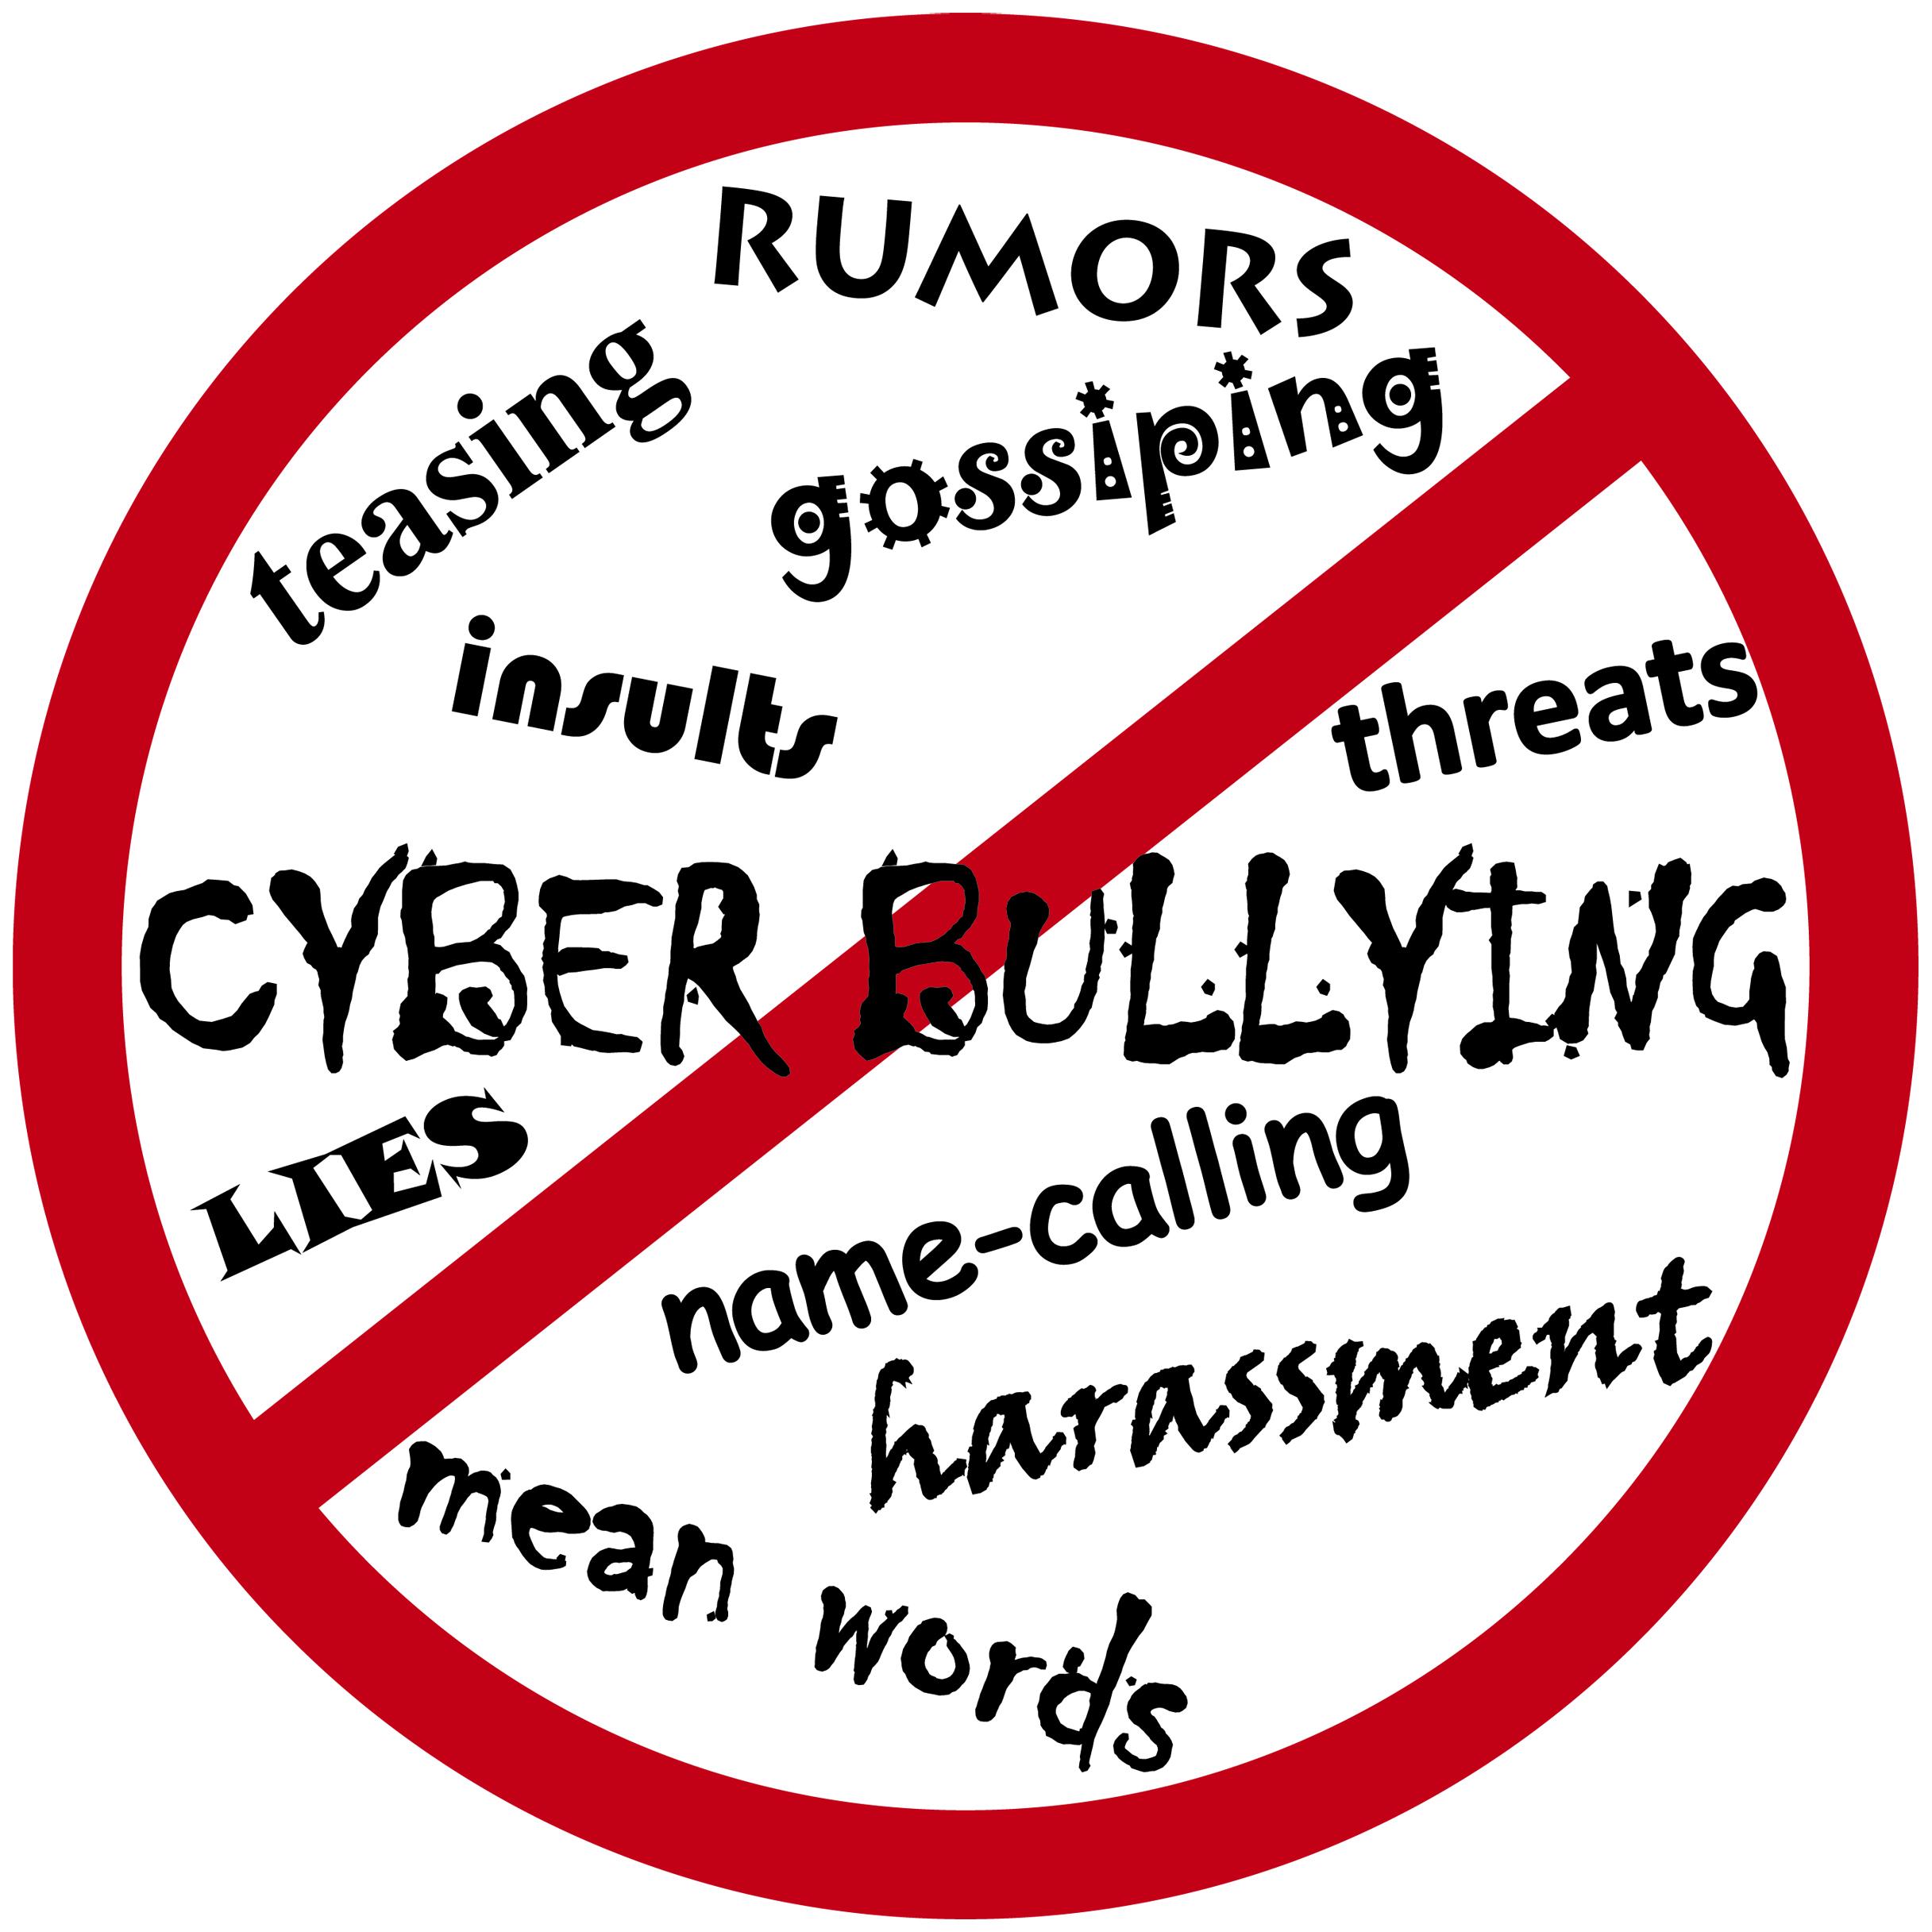 Cyberbullying photos